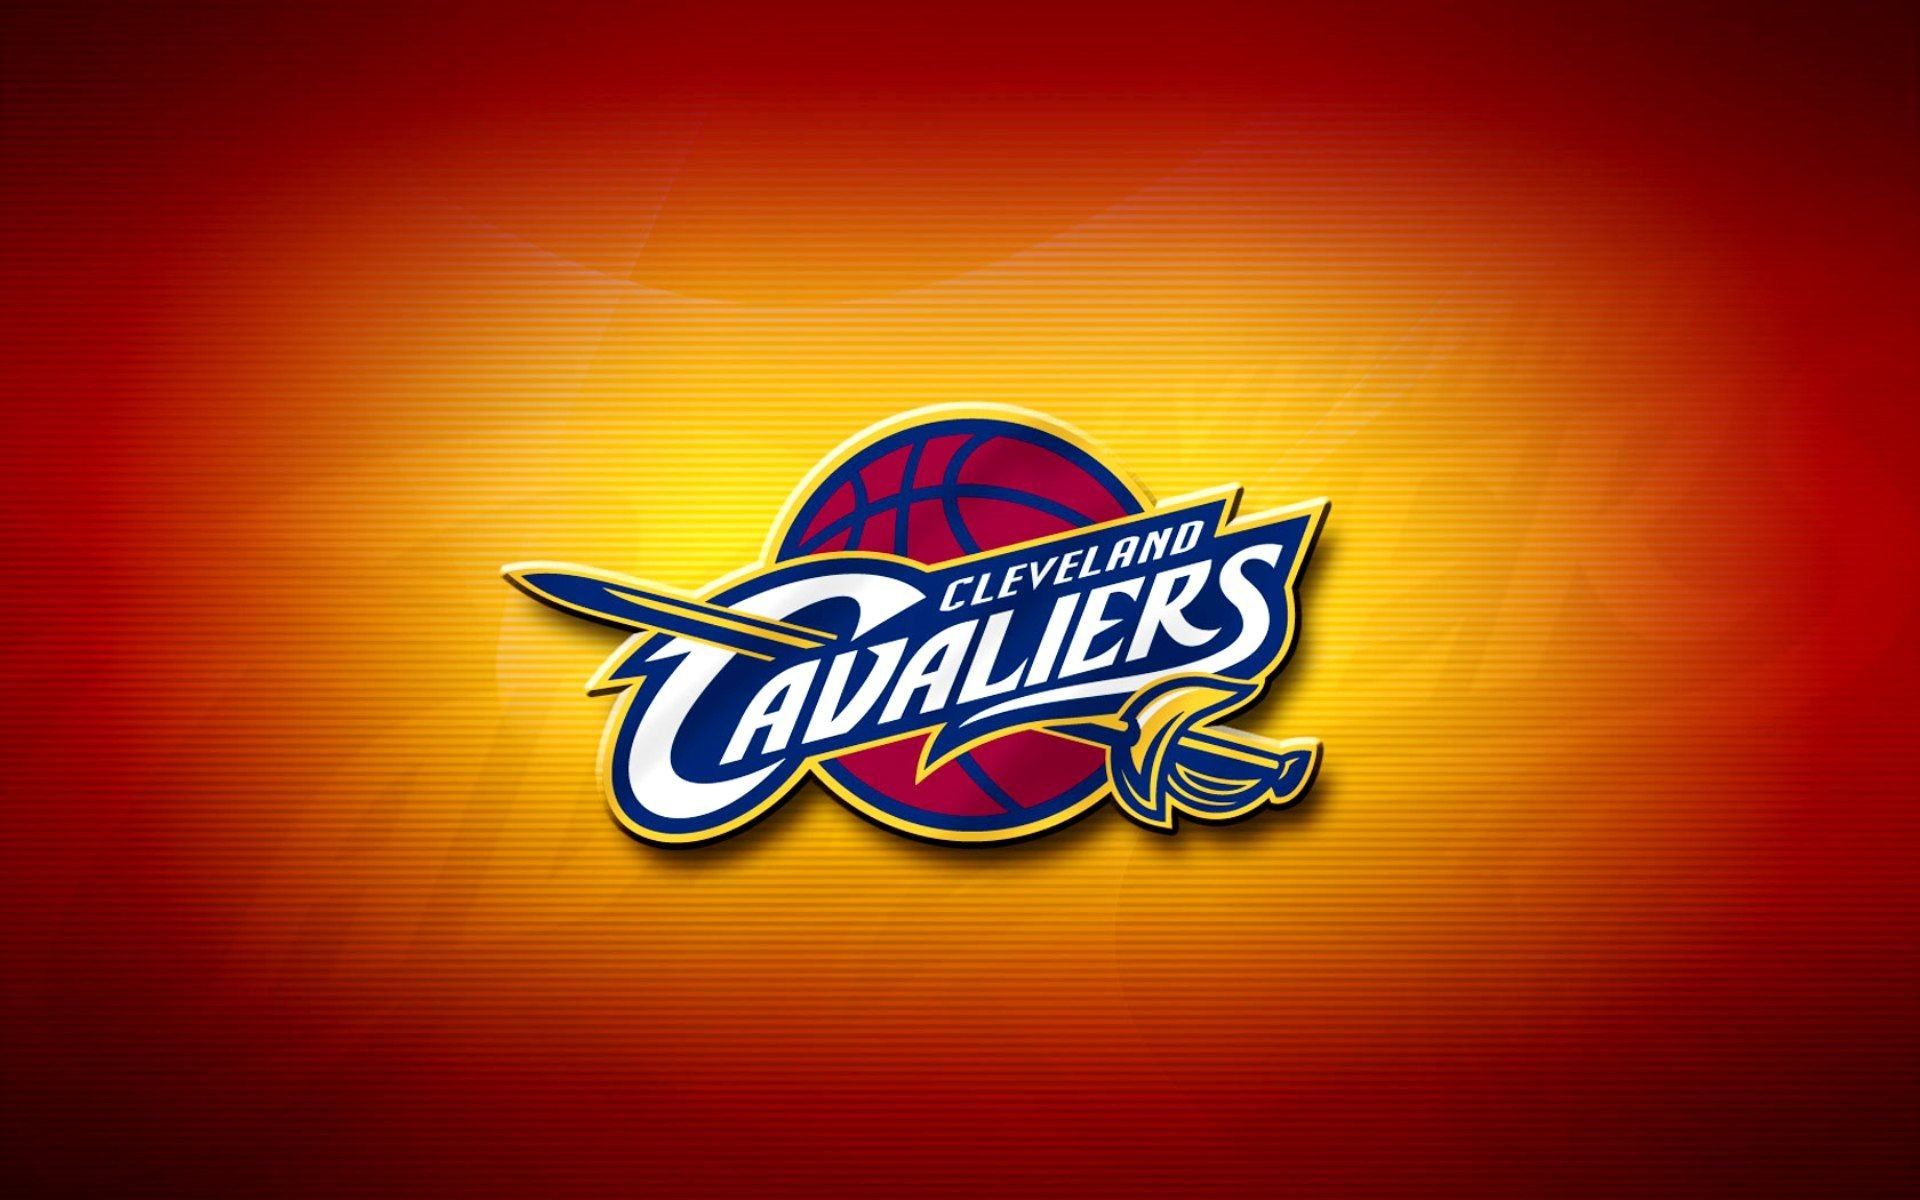 Cleveland Cavaliers Logo Wallpaper Basketball Team | NBA to Days .